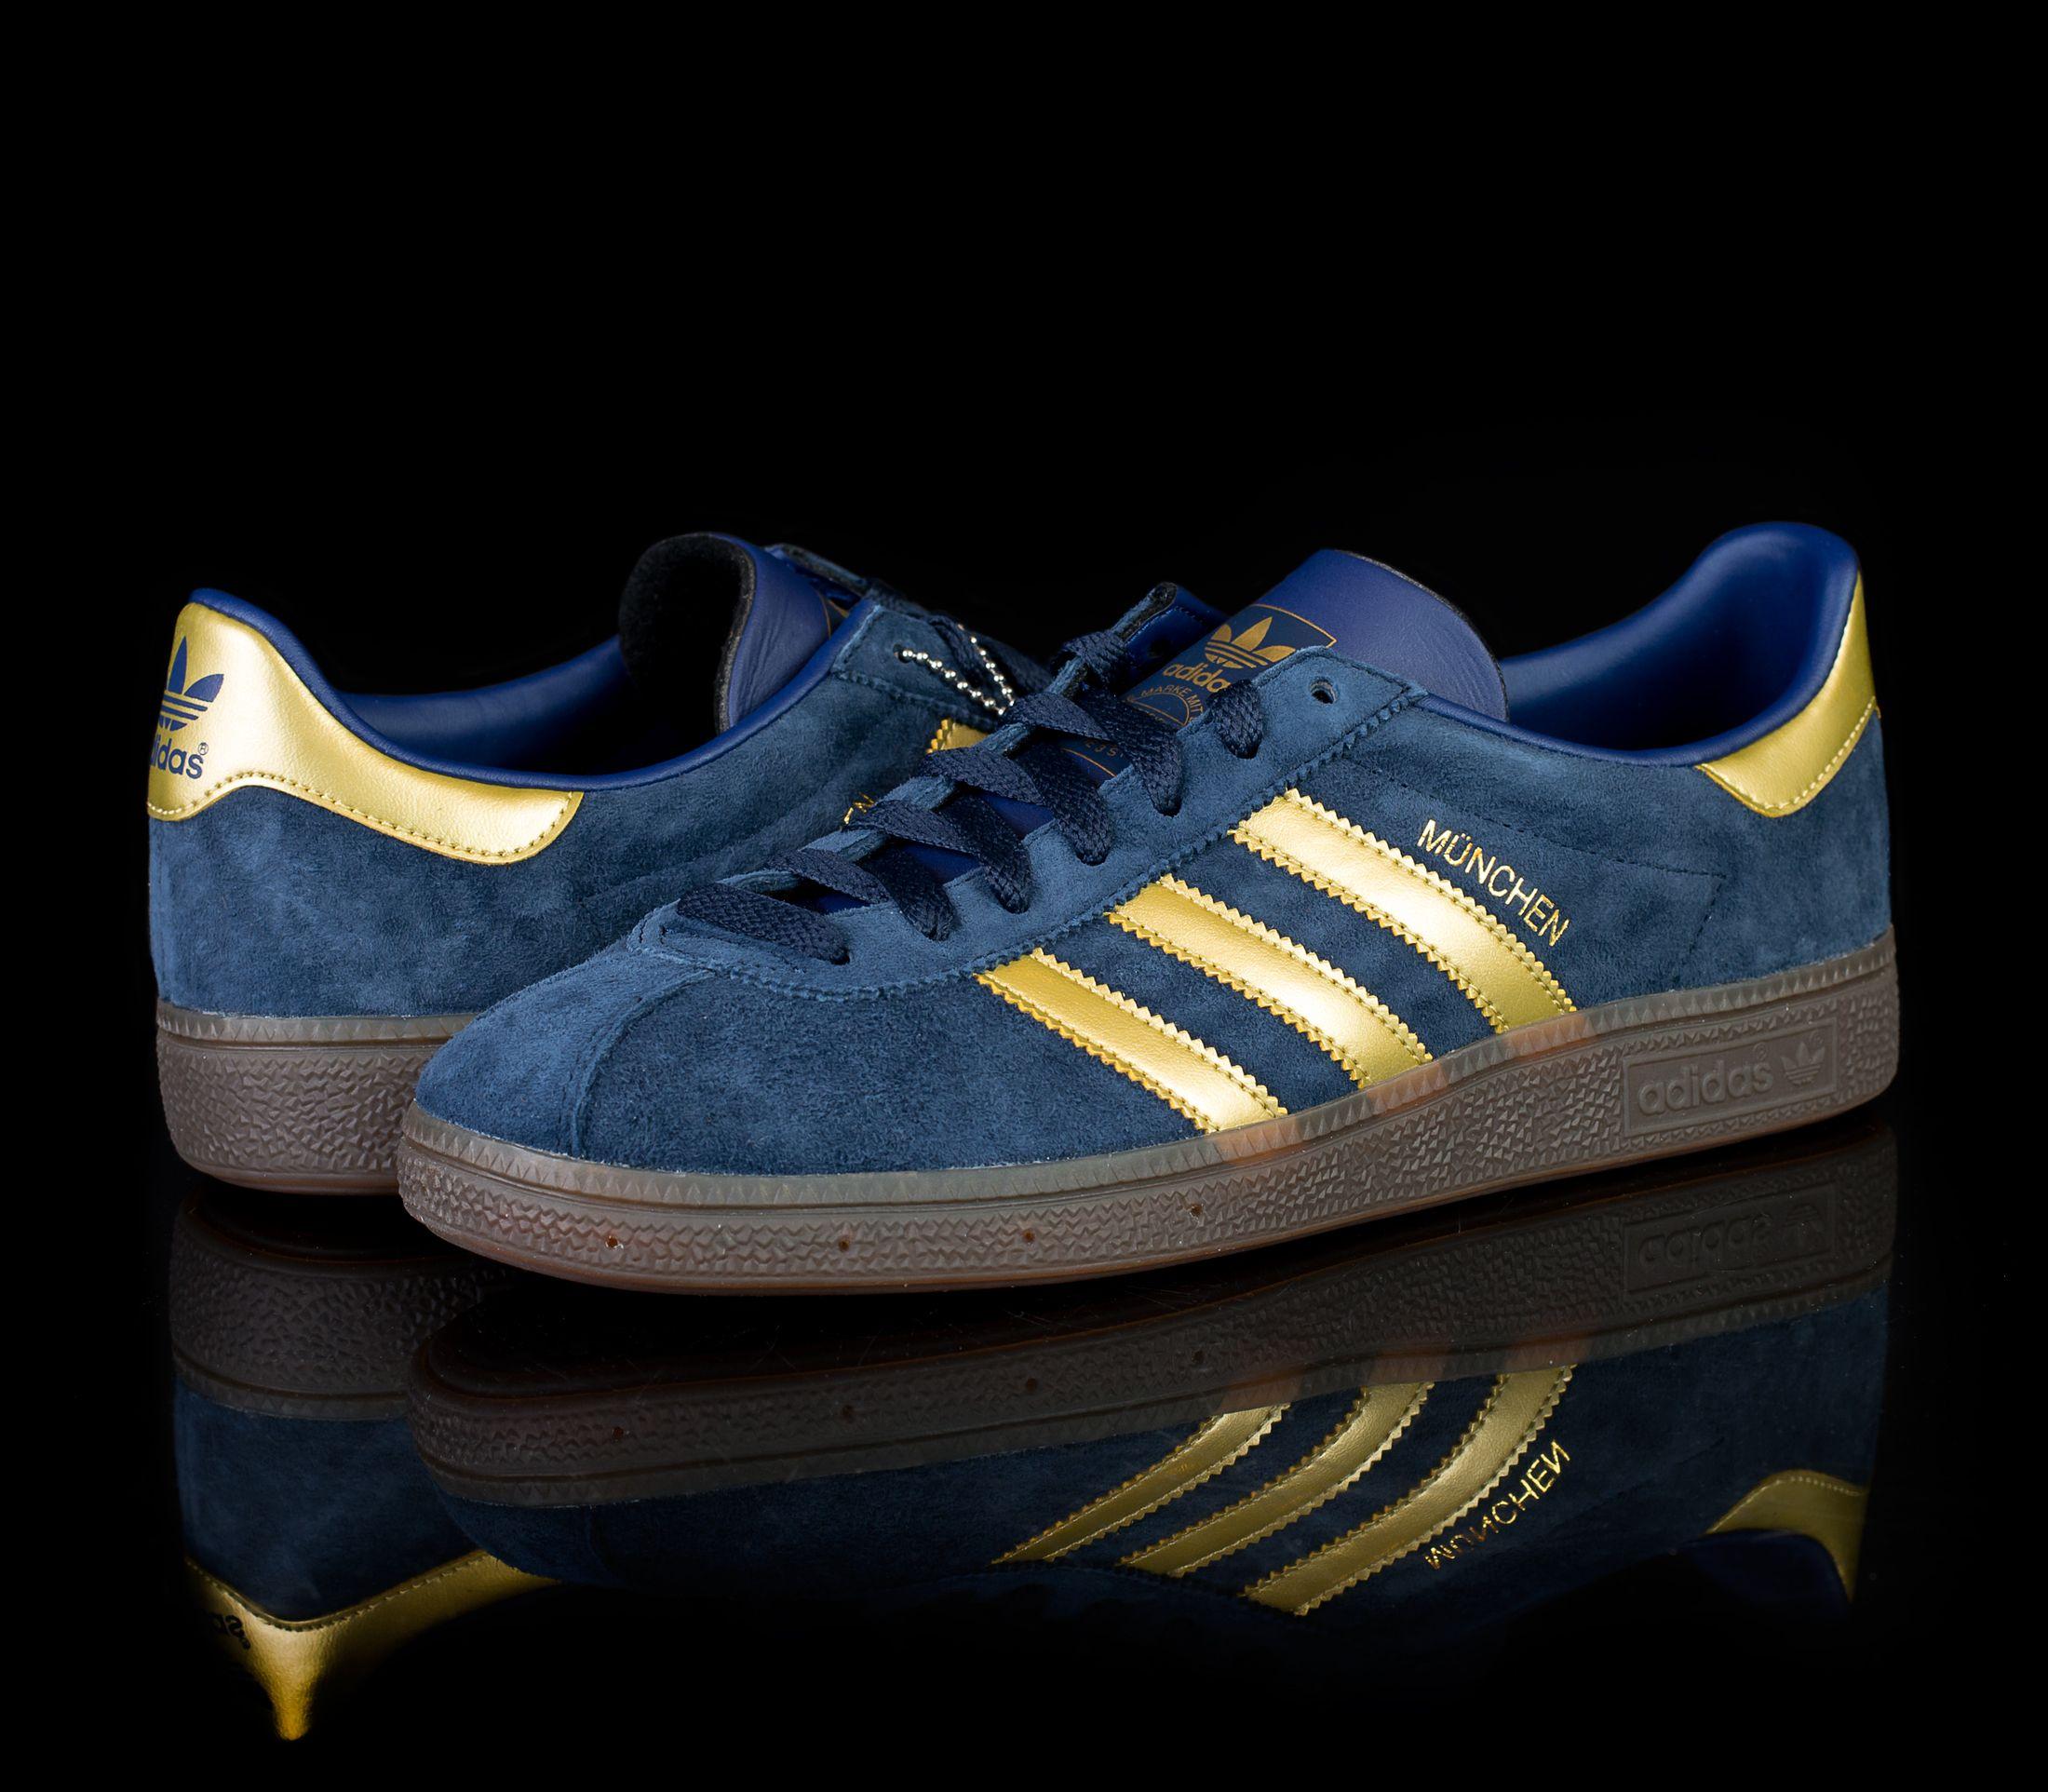 266e490ebc908c adidas spezial yellow and blue